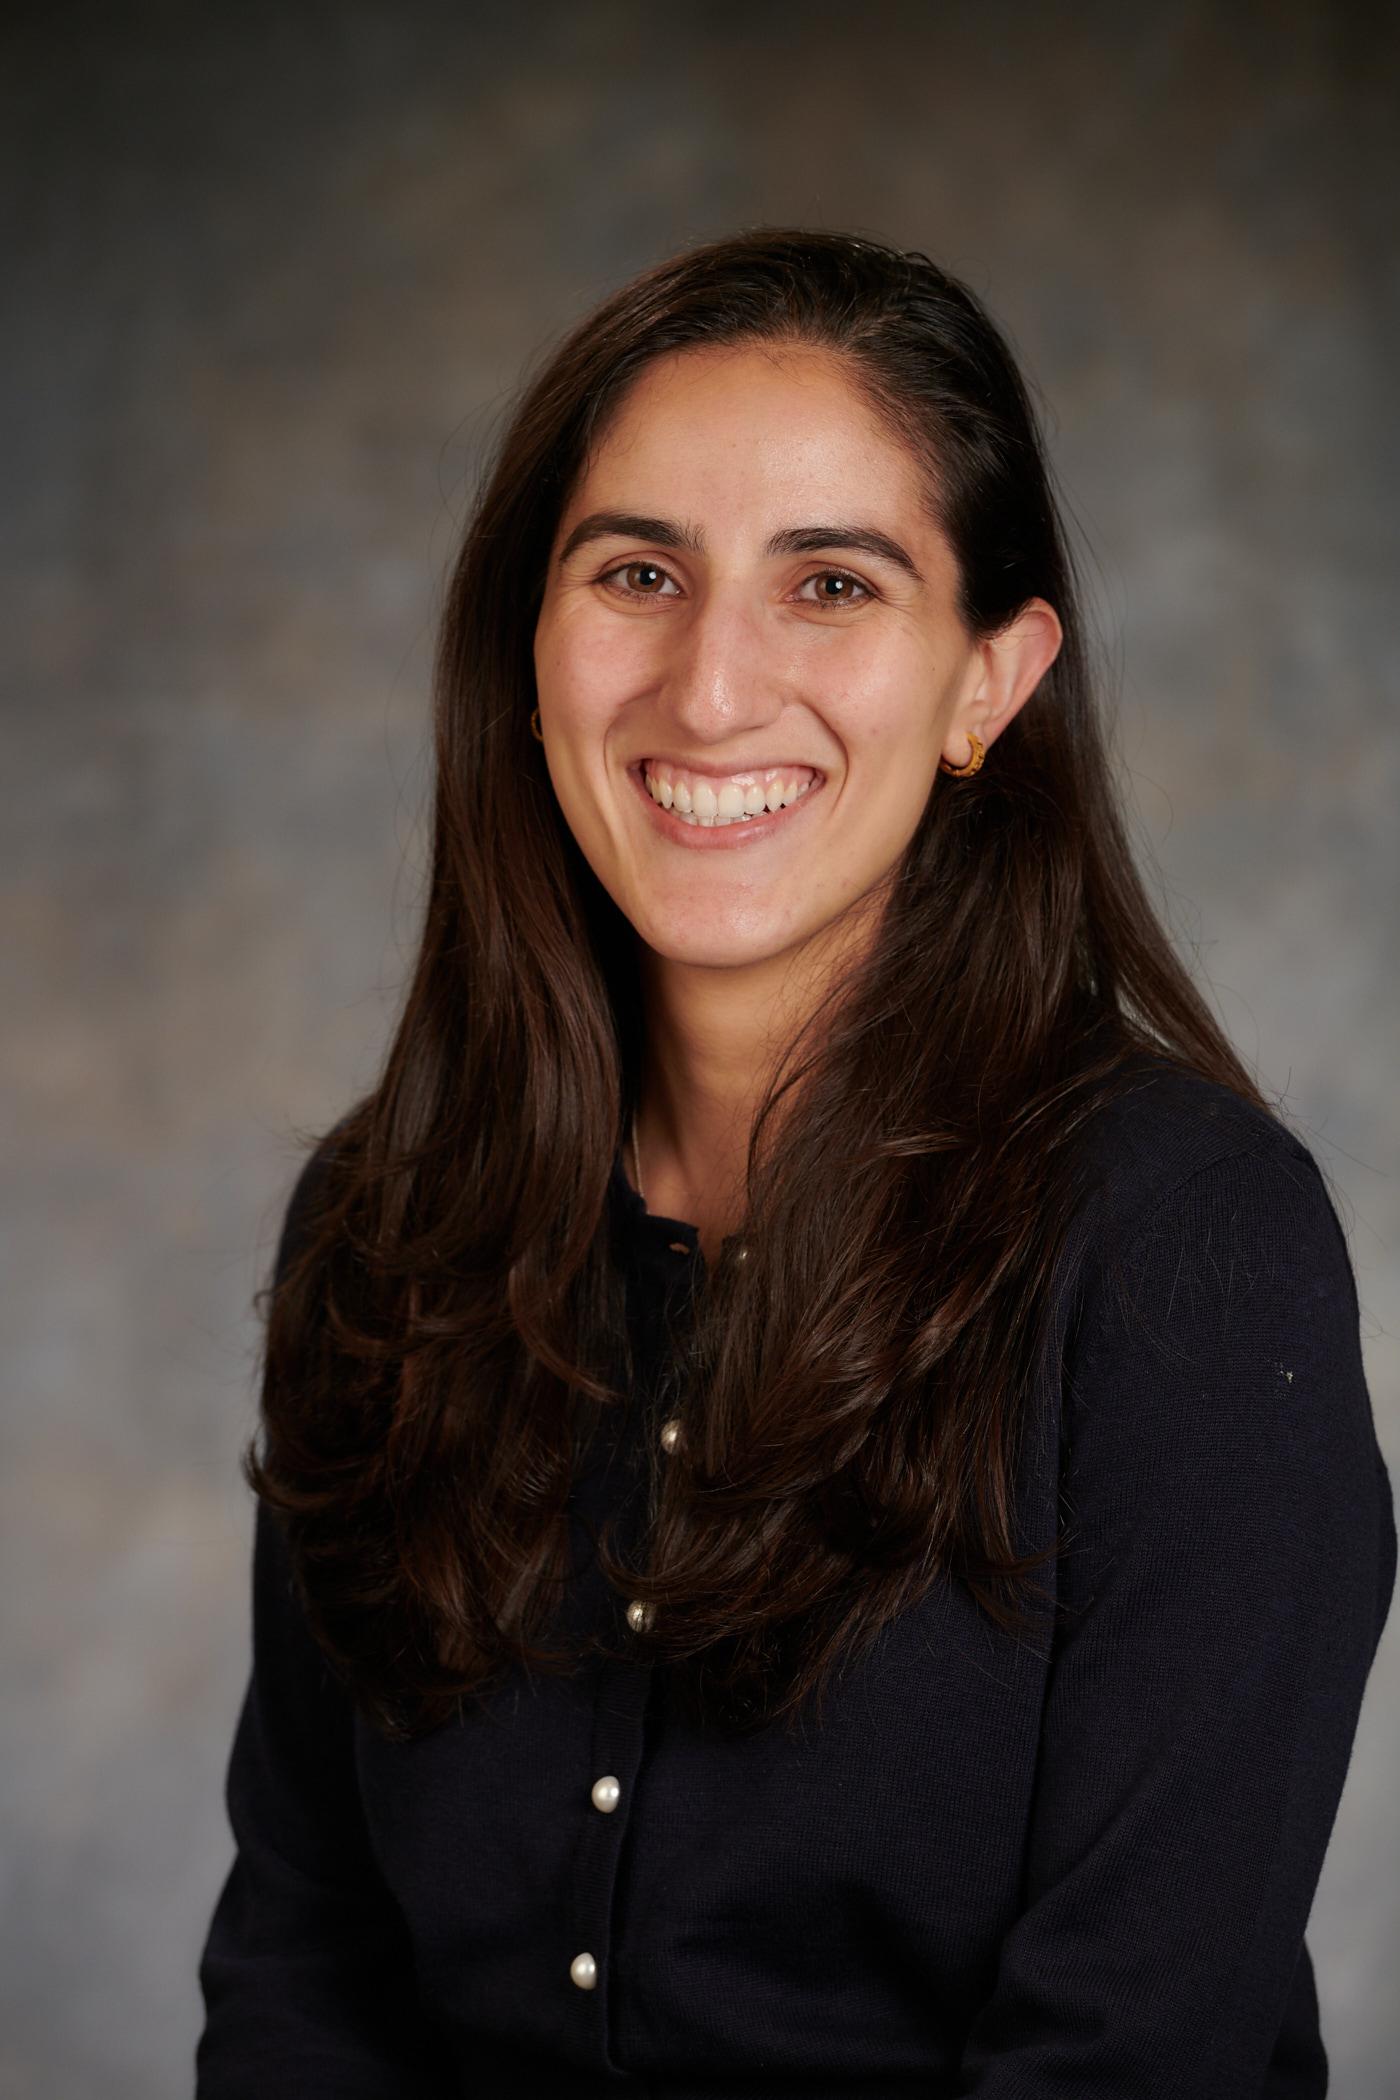 ASUCLA - 2019-2020 Communications Board Portraits. ASUCLA Photo Studio, UCLA, CA. October 7th, 2019 Behmanesh_Jessica_007.NEF Copyright  Don Liebig/ASUCLA